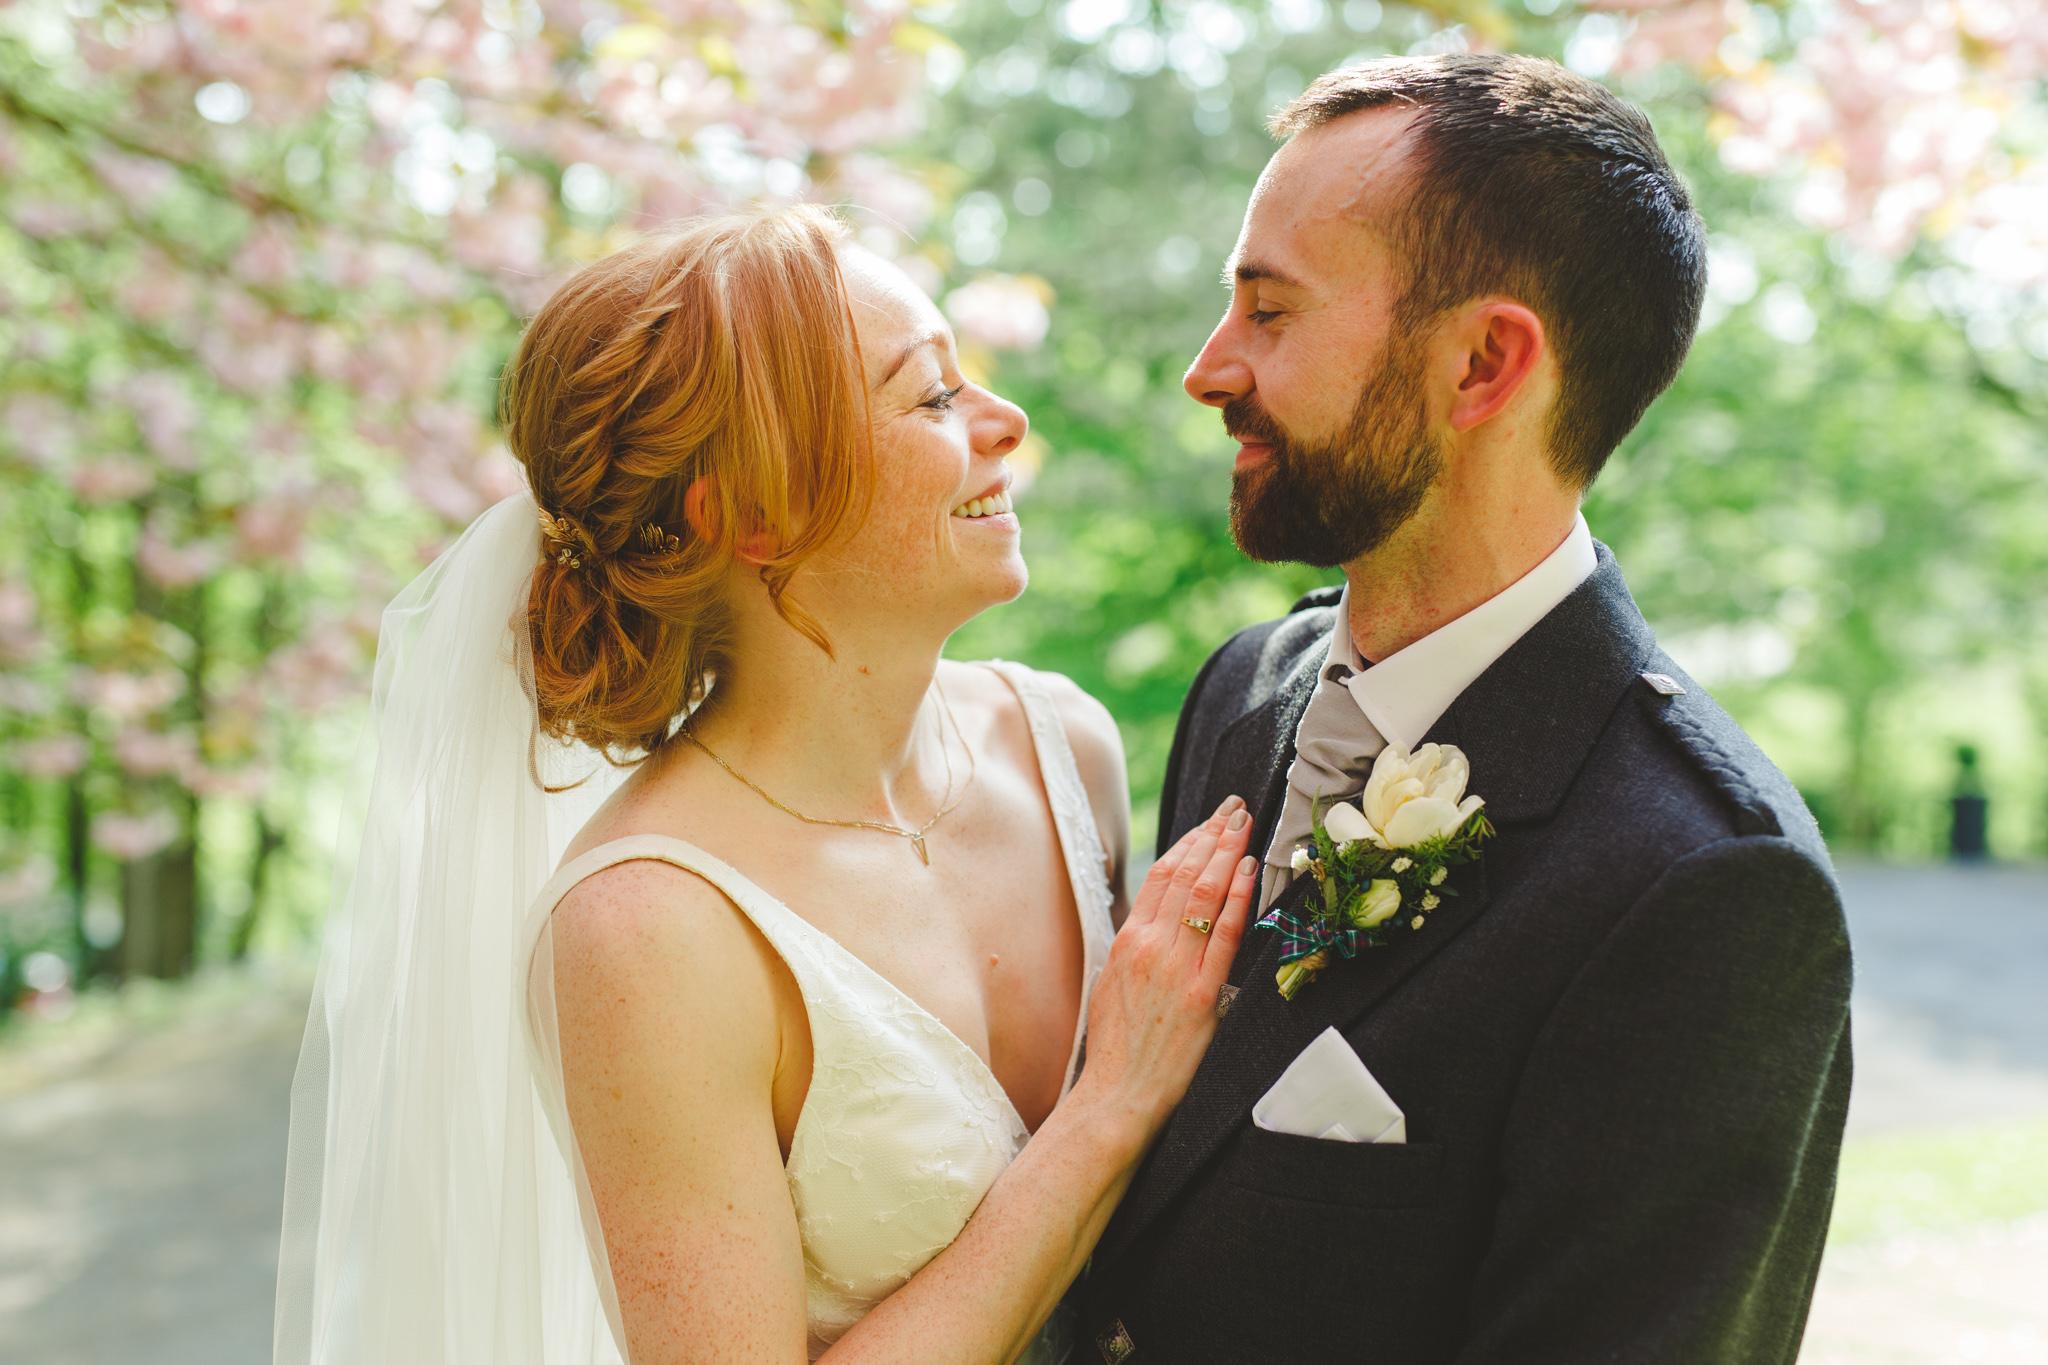 derbyshire-wedding-photographer-videographer-camera-hannah-60.jpg